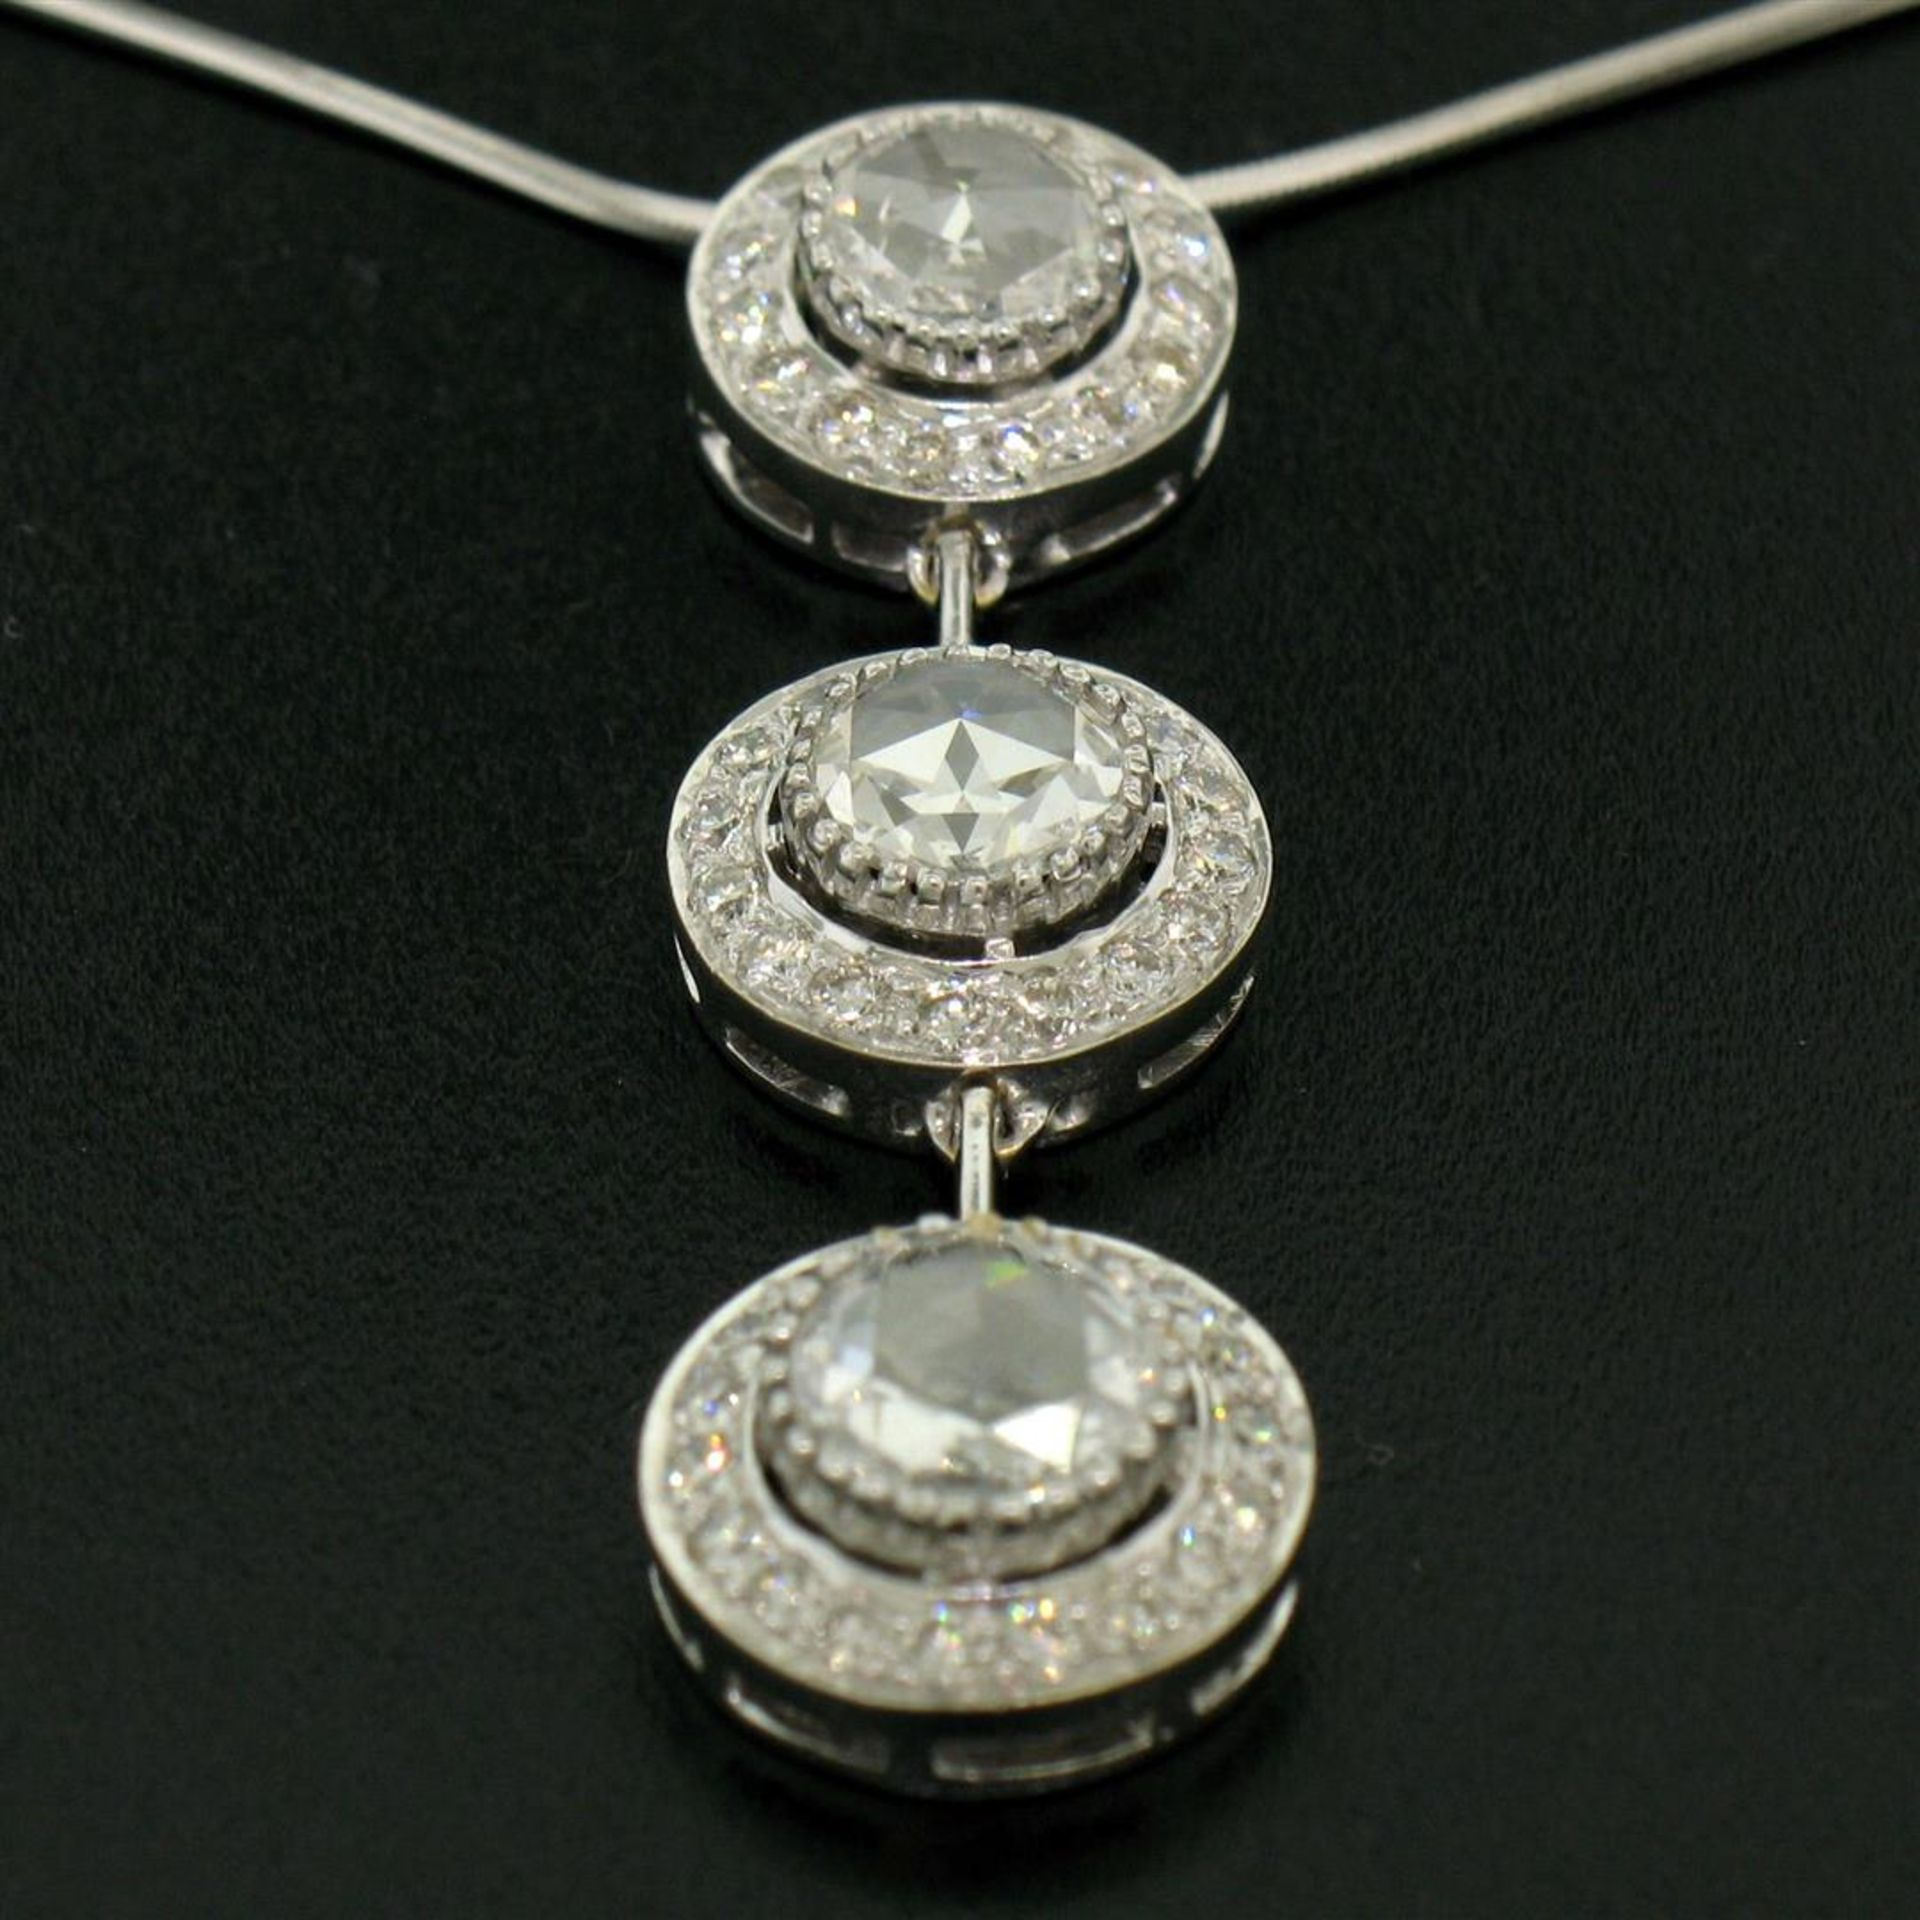 Vintage 18K White Gold 2.59 ctw 3 Rose Cut Diamond Drop Pendant w/ Triple Halo - Image 7 of 9